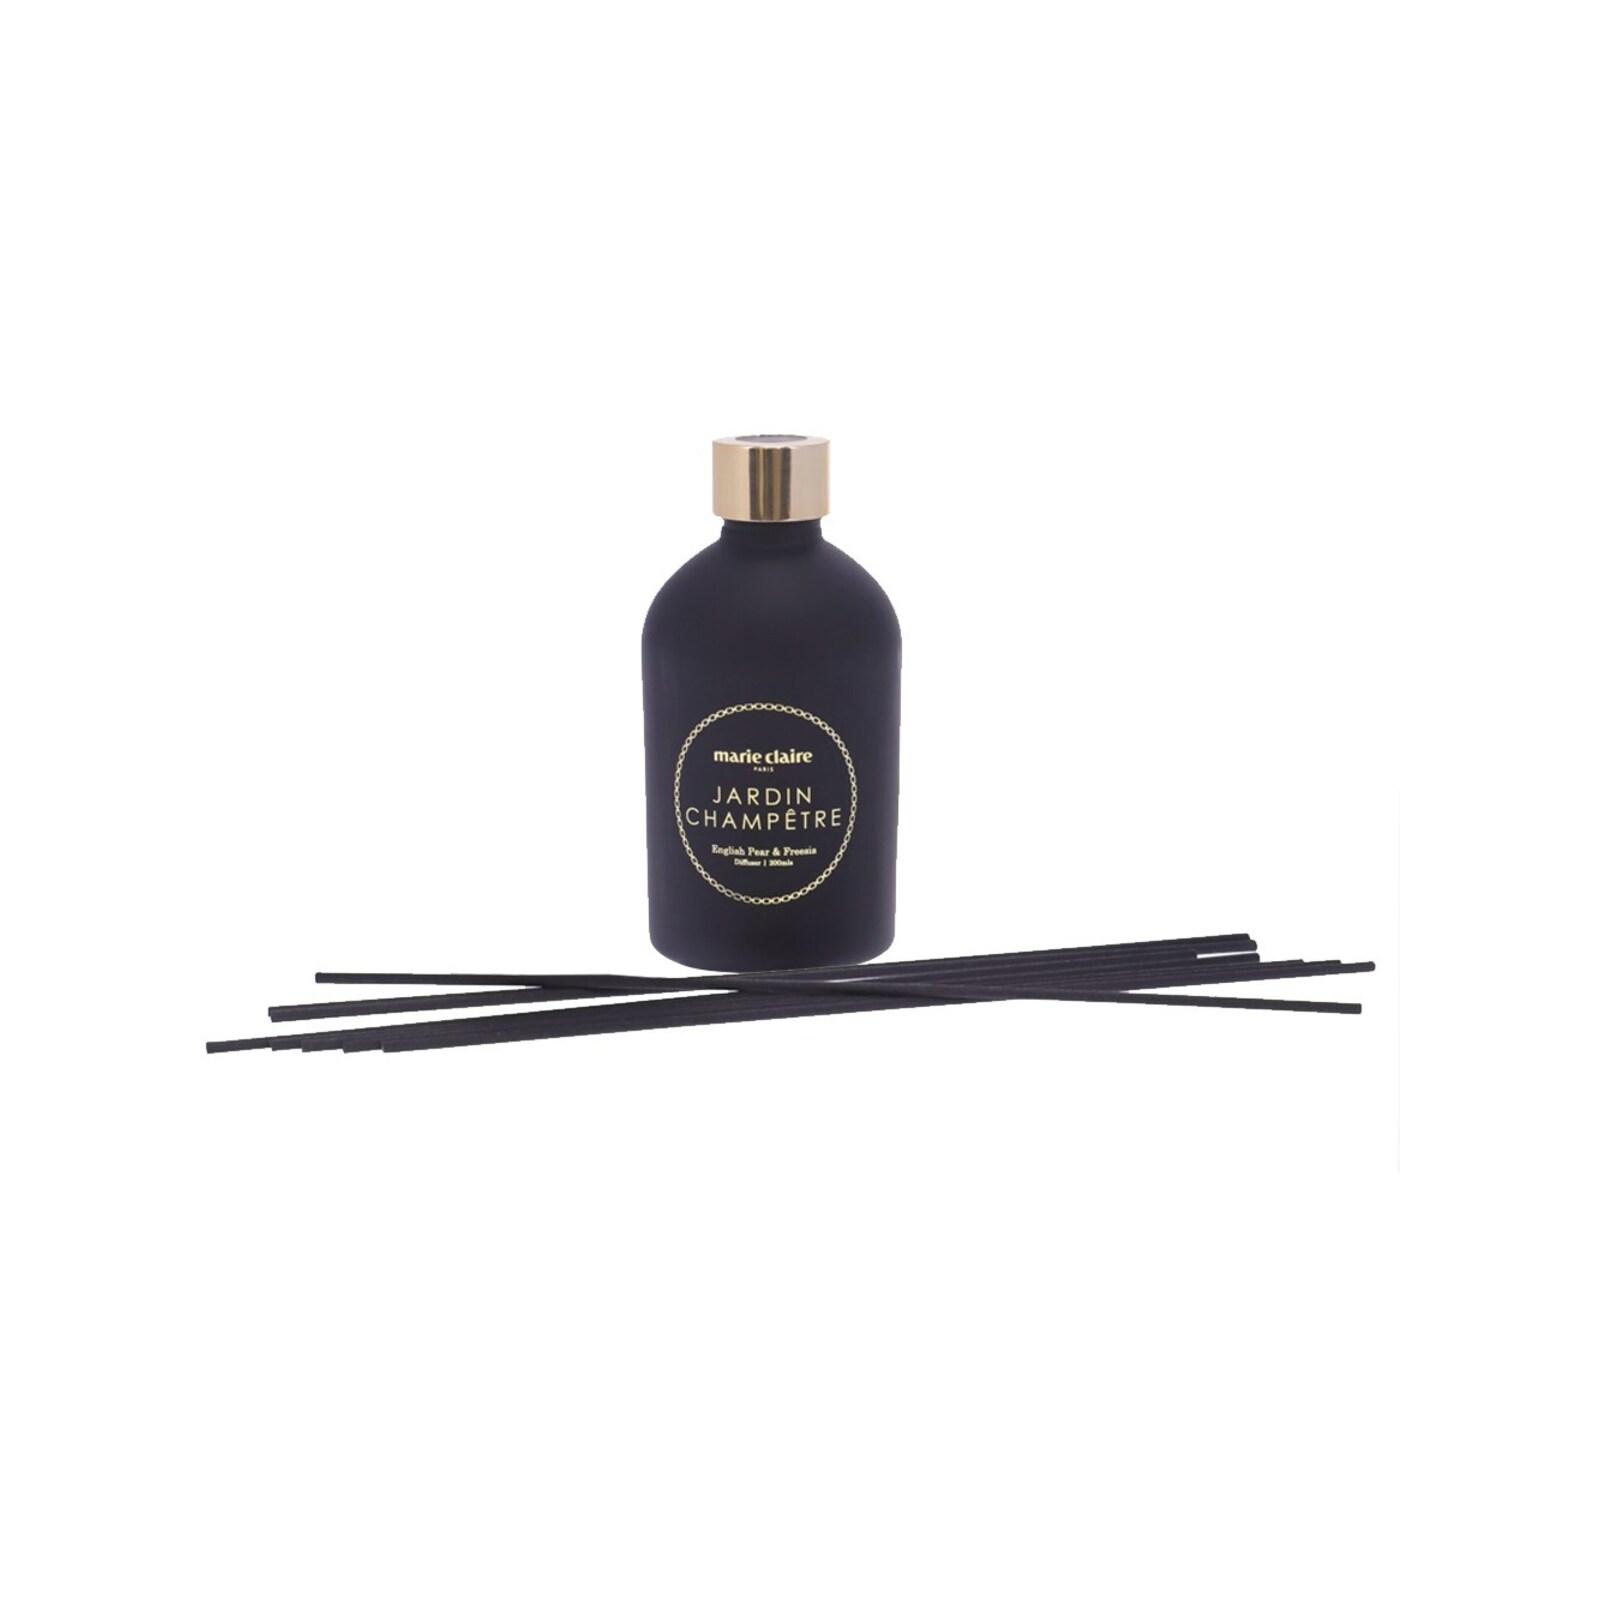 Marie Claire Jardin Champetre Fleur Reed Diffuser Black